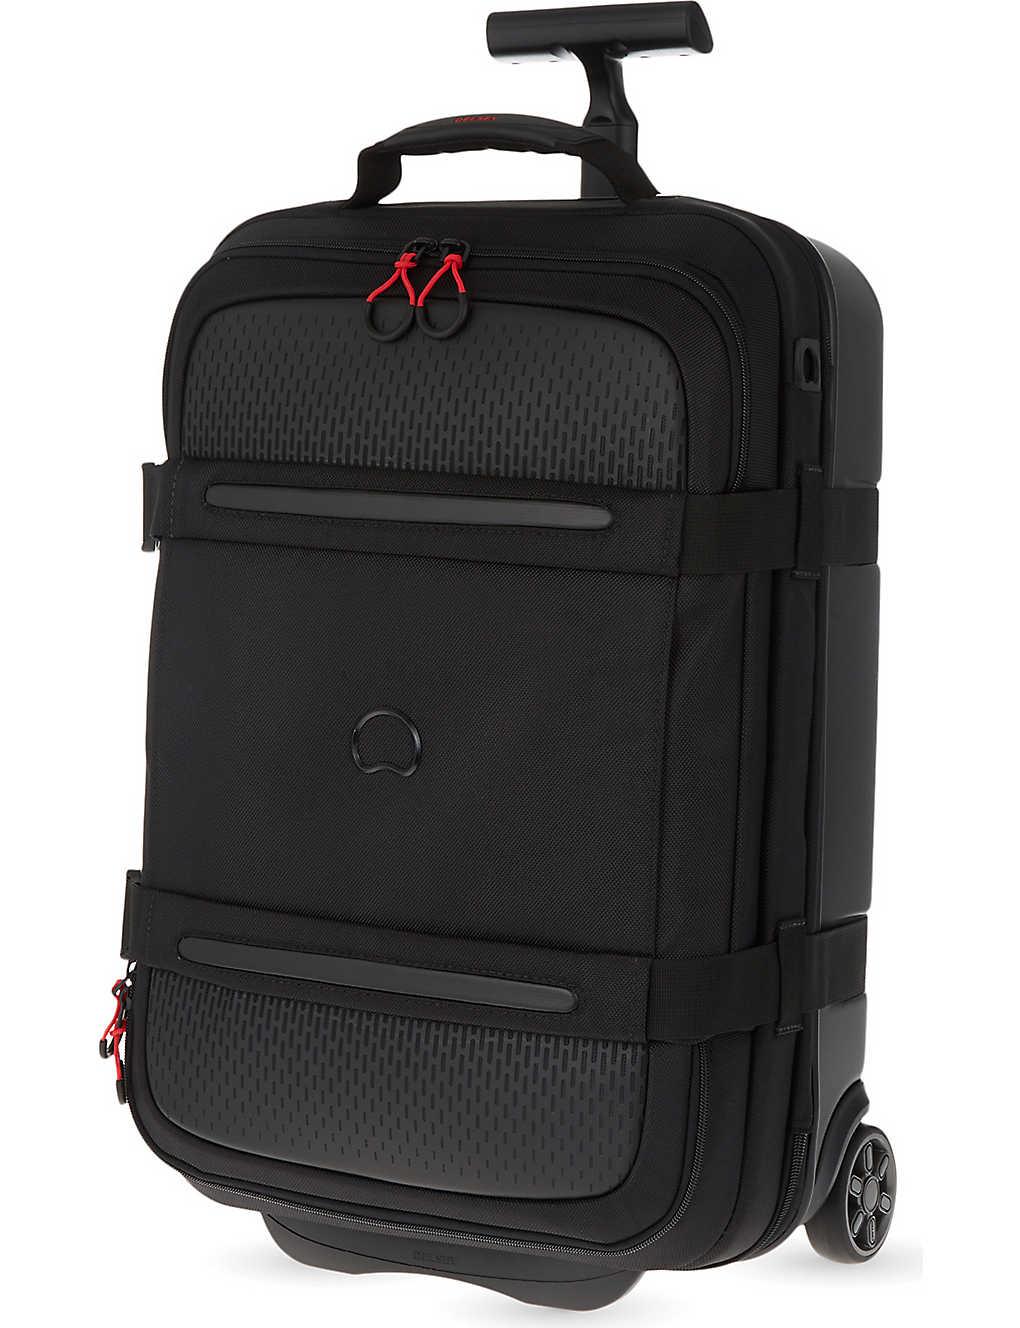 DELSEY - Cabin luggage - Luggage - Bags - Selfridges | Shop Online